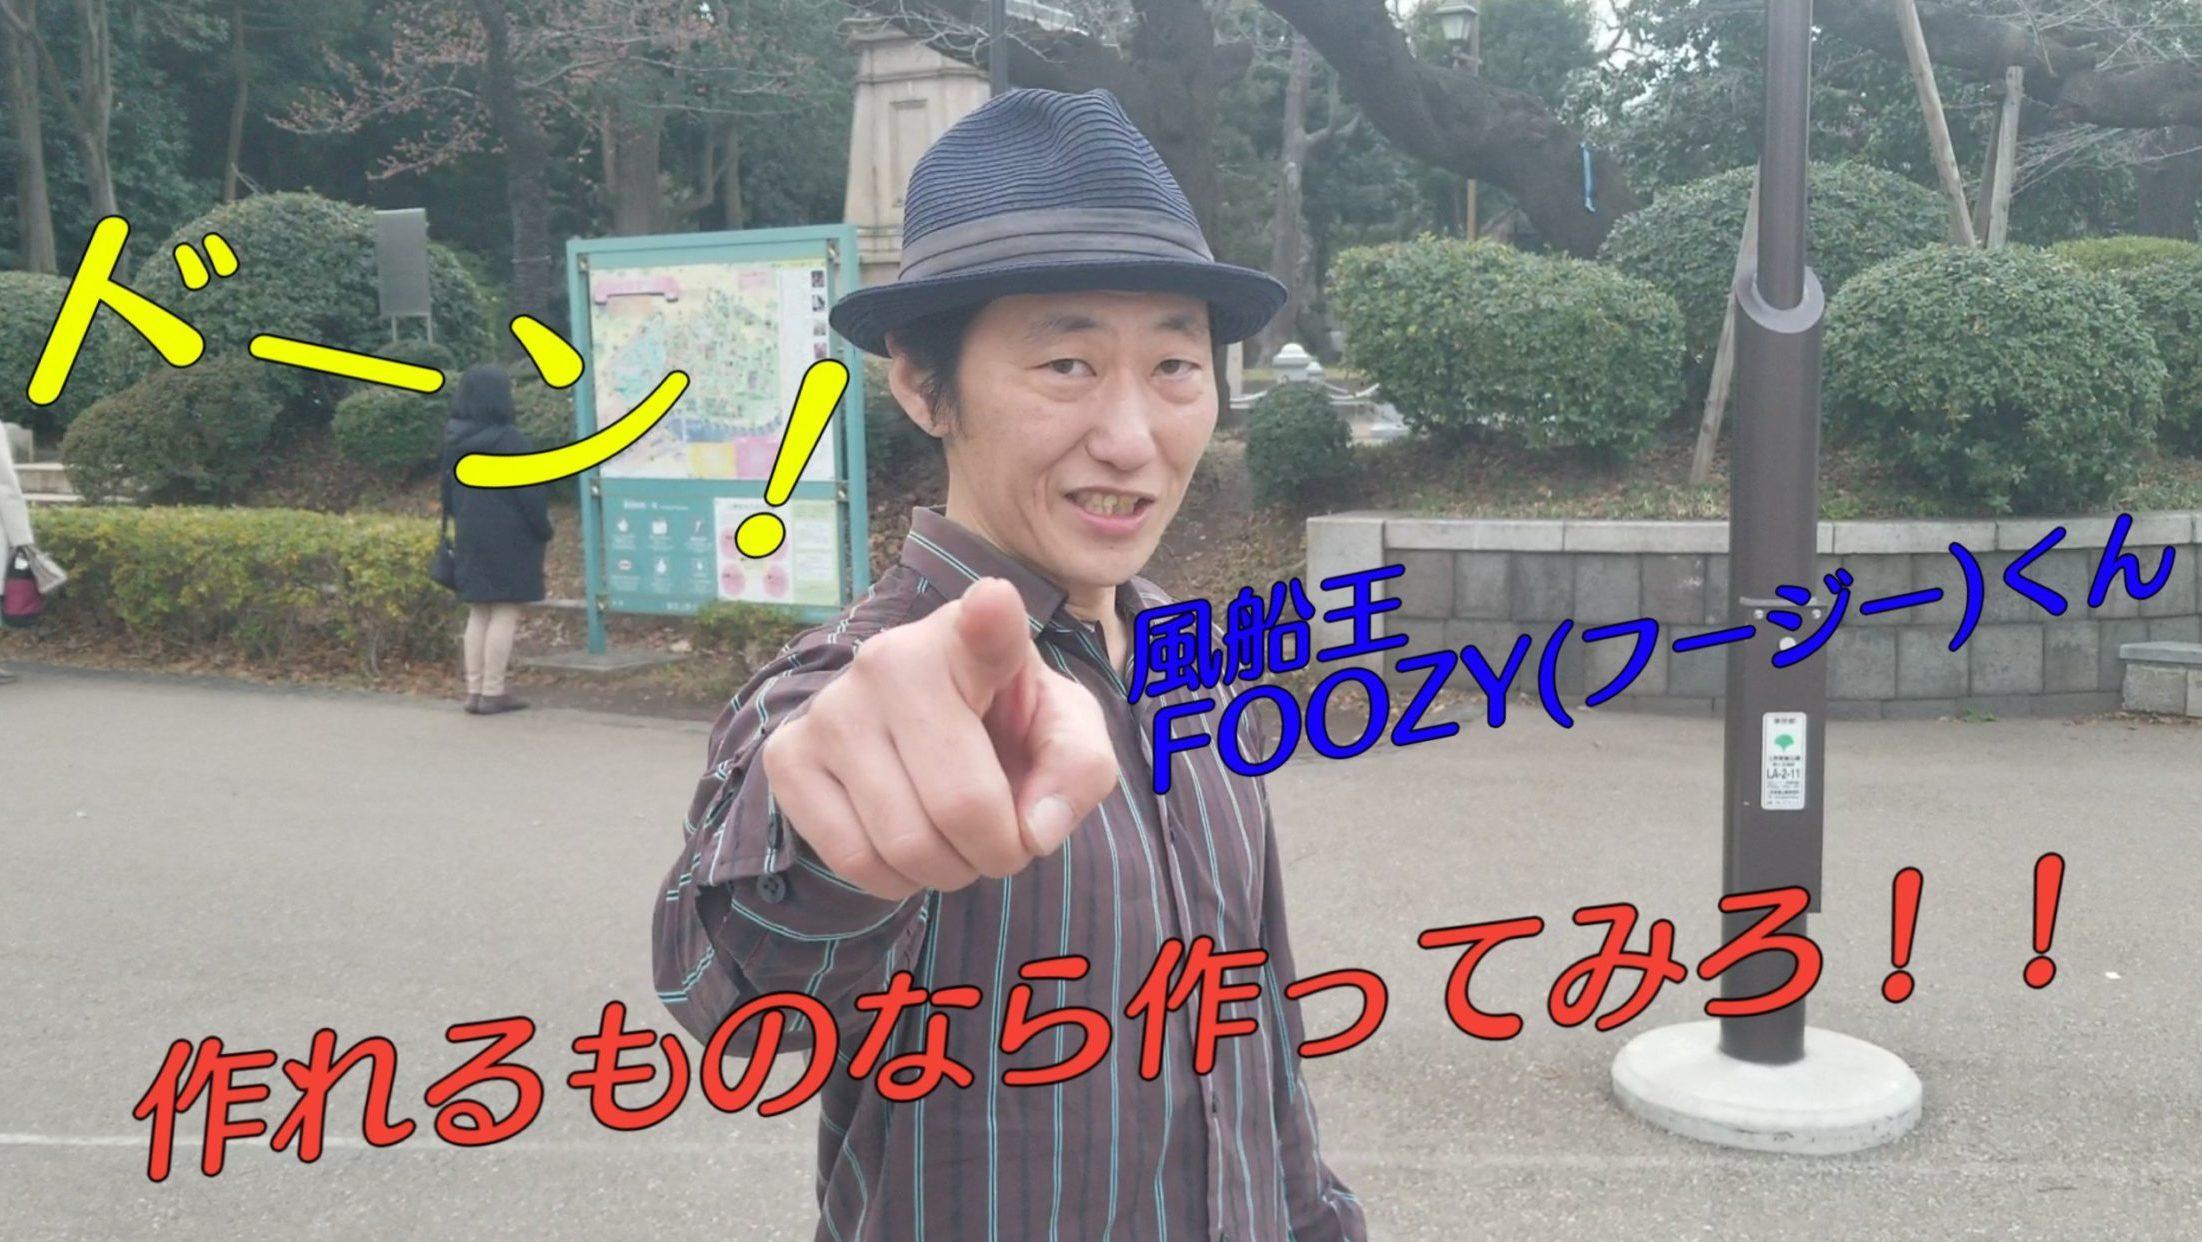 GEN(ジェン)から風船王FOOZY(フージー)くんへの挑戦状!!